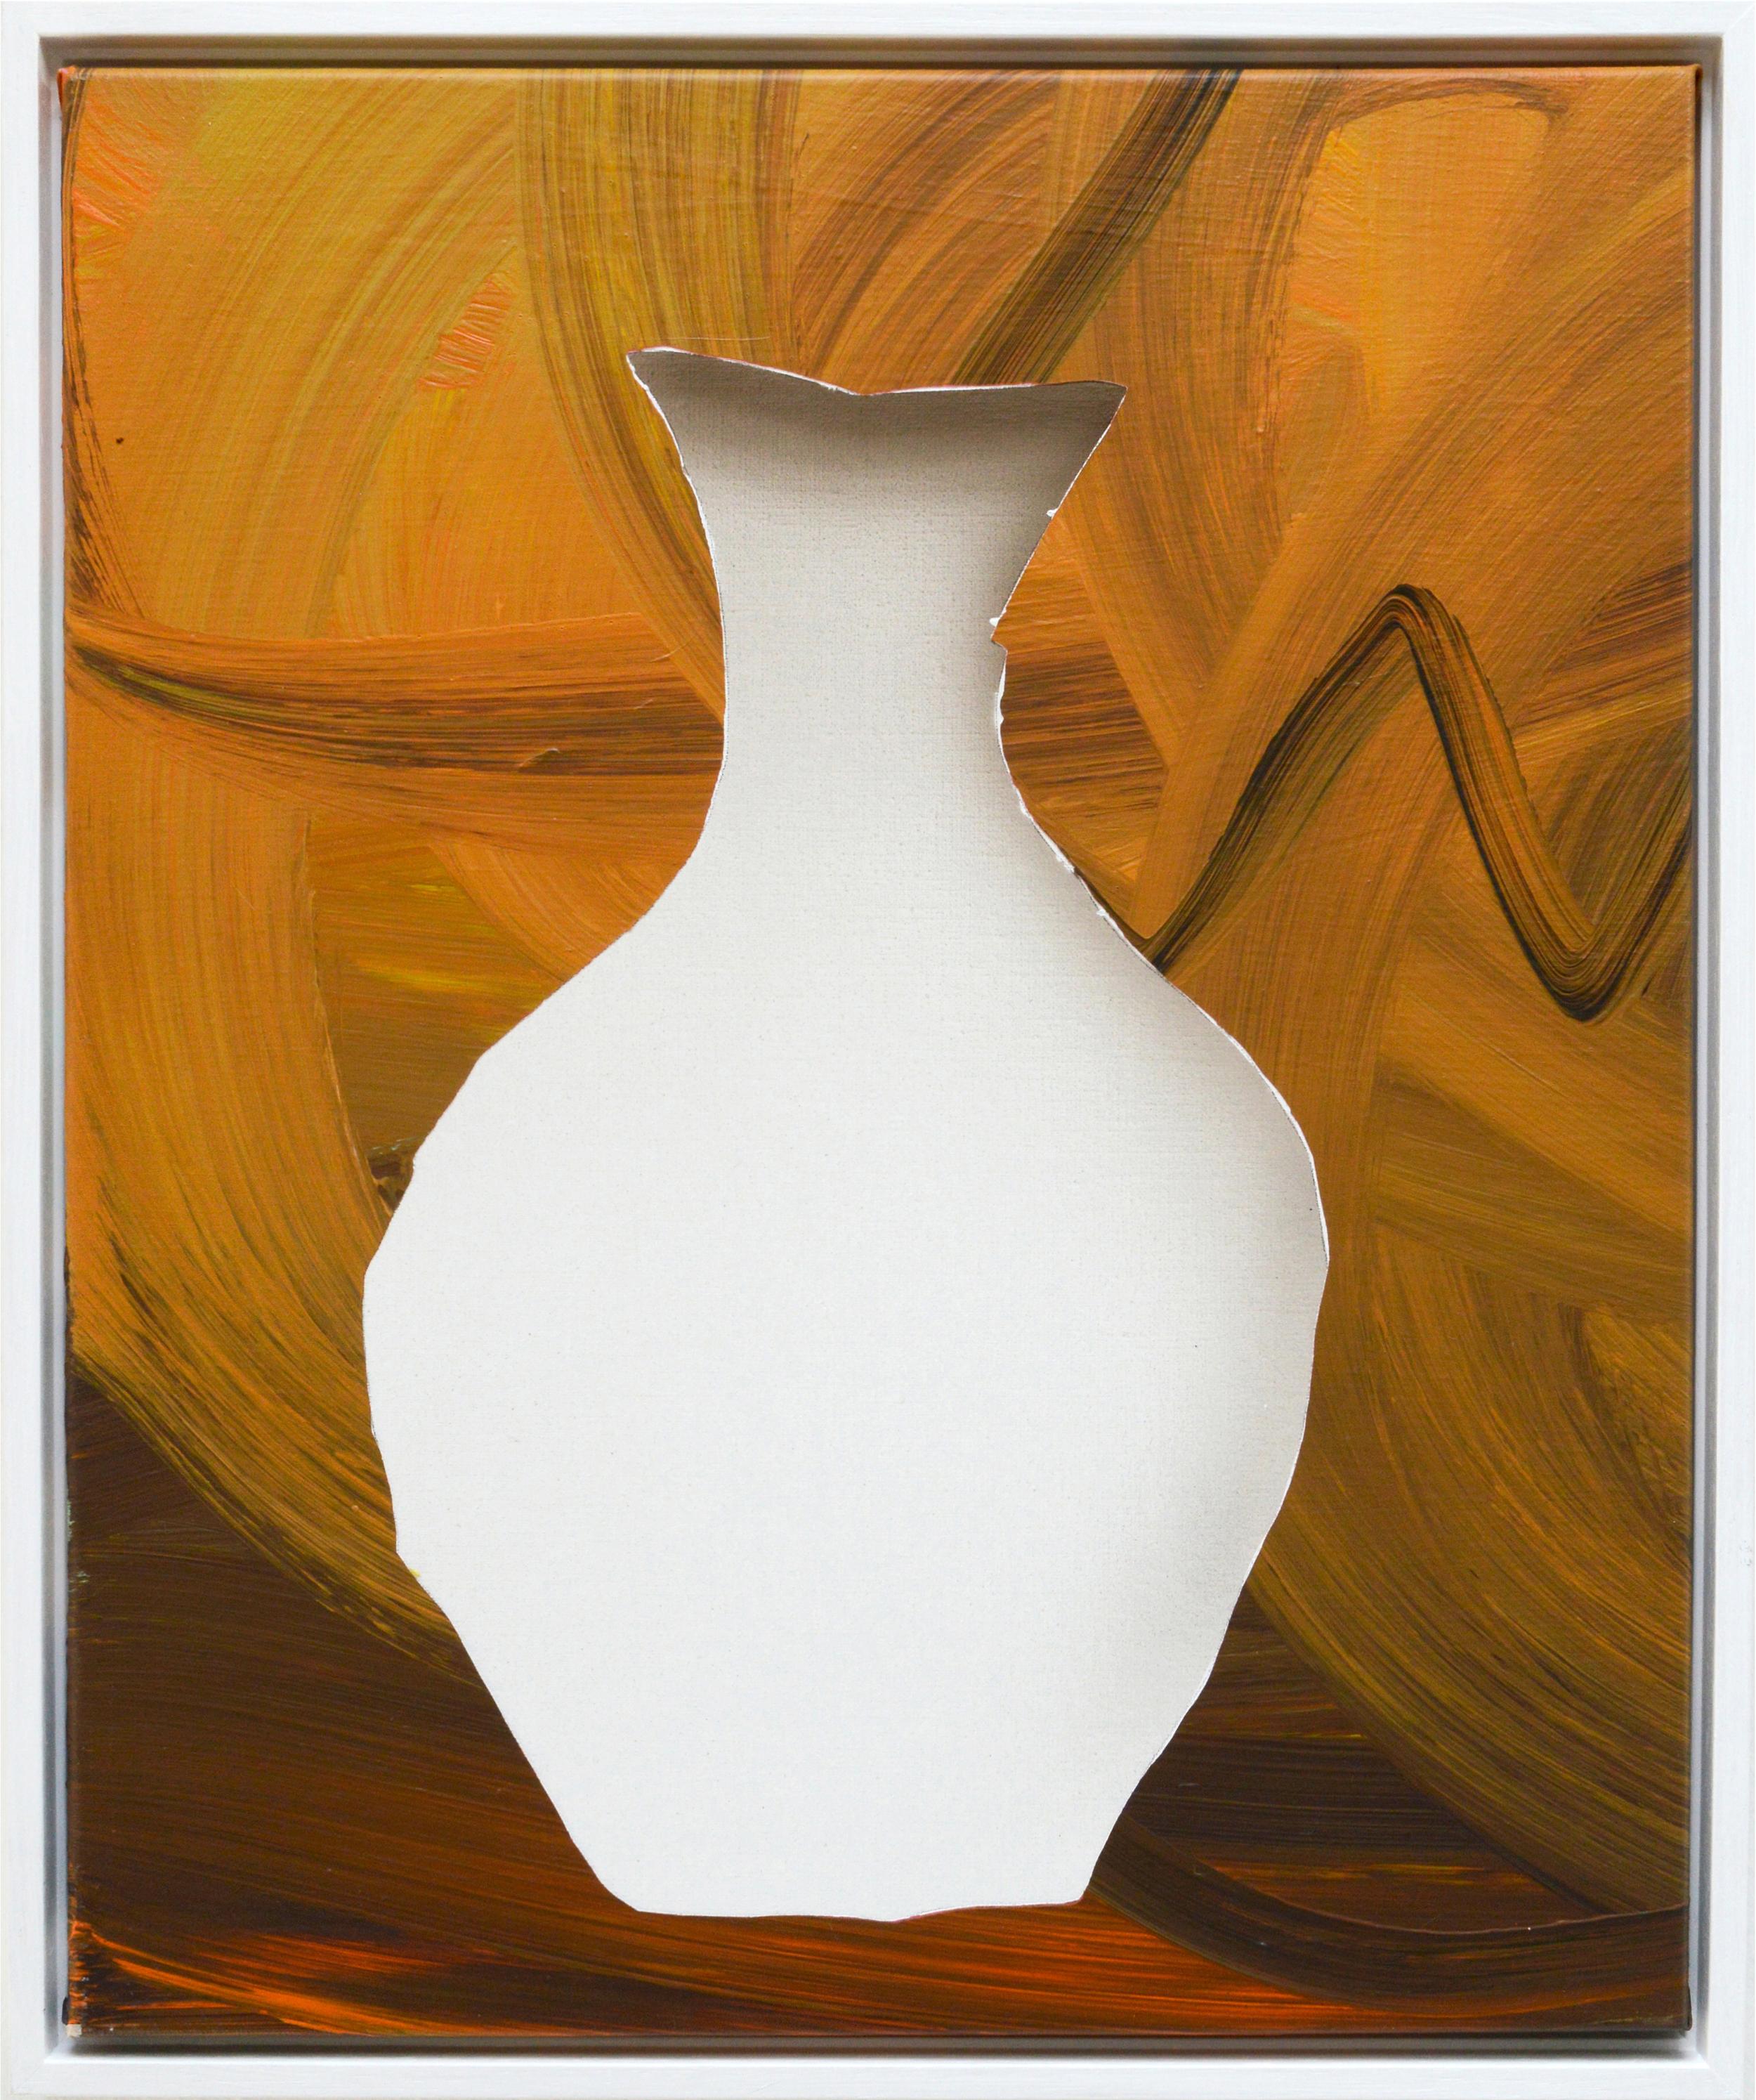 Vase Brown | 2015 acrylic on linen 55 x 45 cm